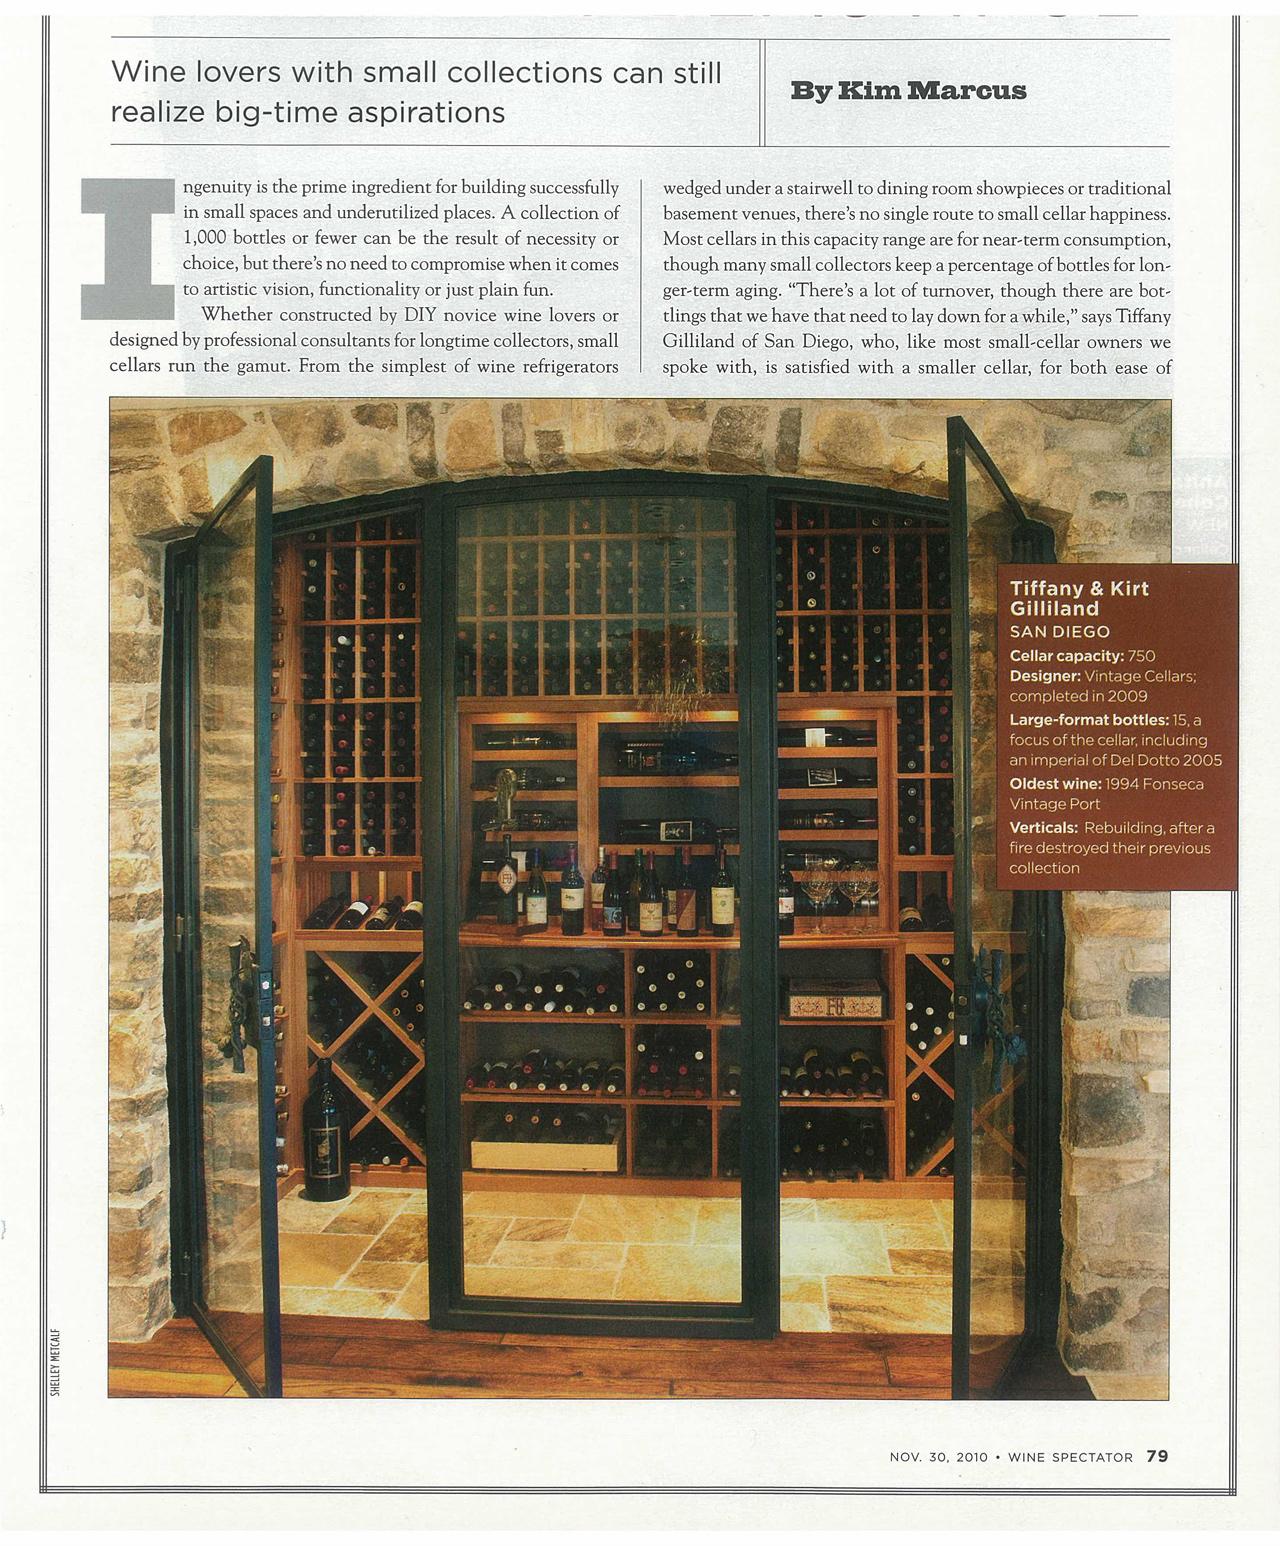 Wine Refrigerator Reviews Wine Spectator vintage cellars featured in wine spectator! |